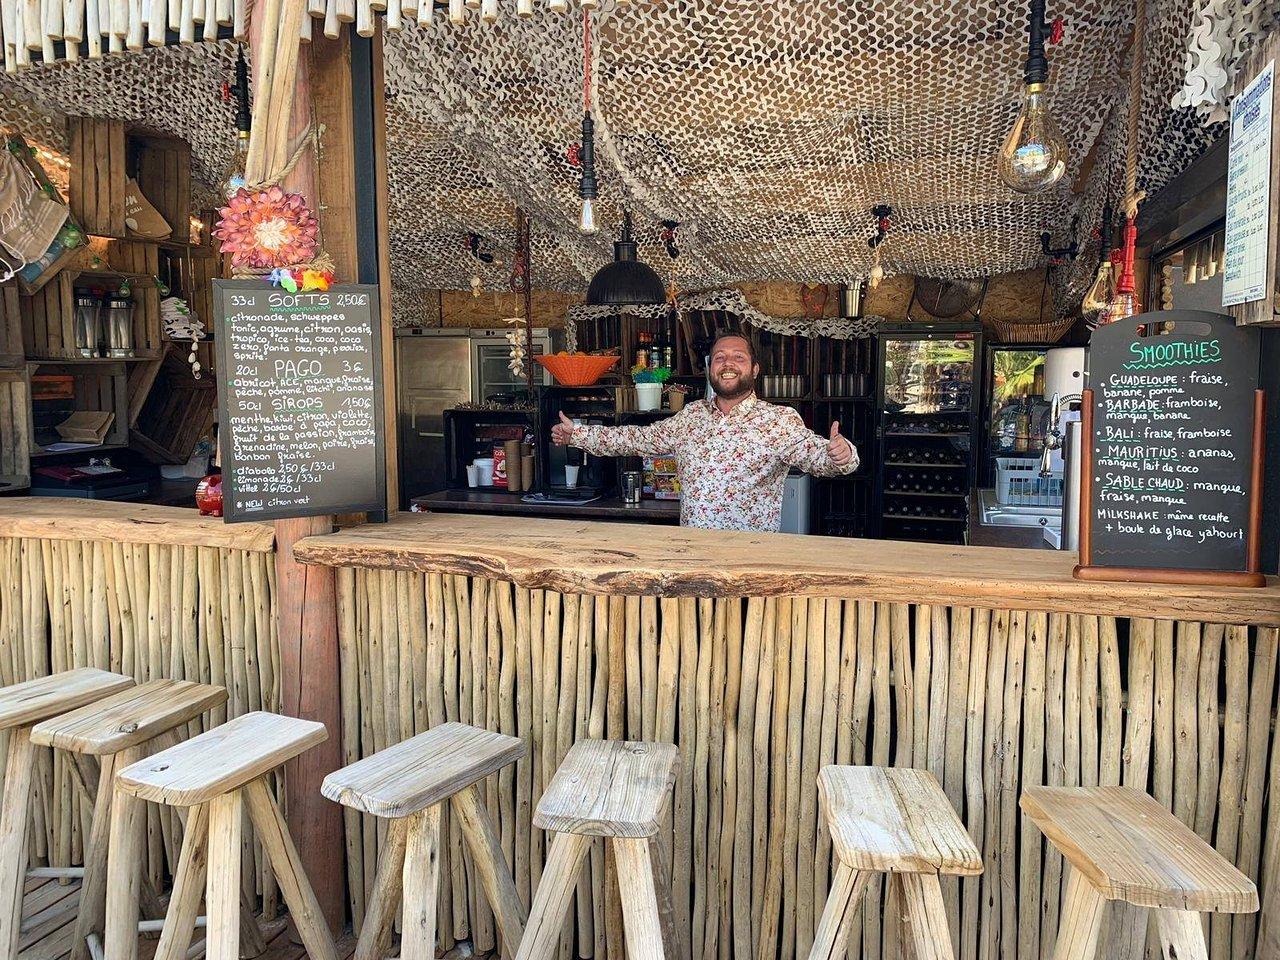 CAMPING LA PIERRE VERTE - Prices & Campground Reviews